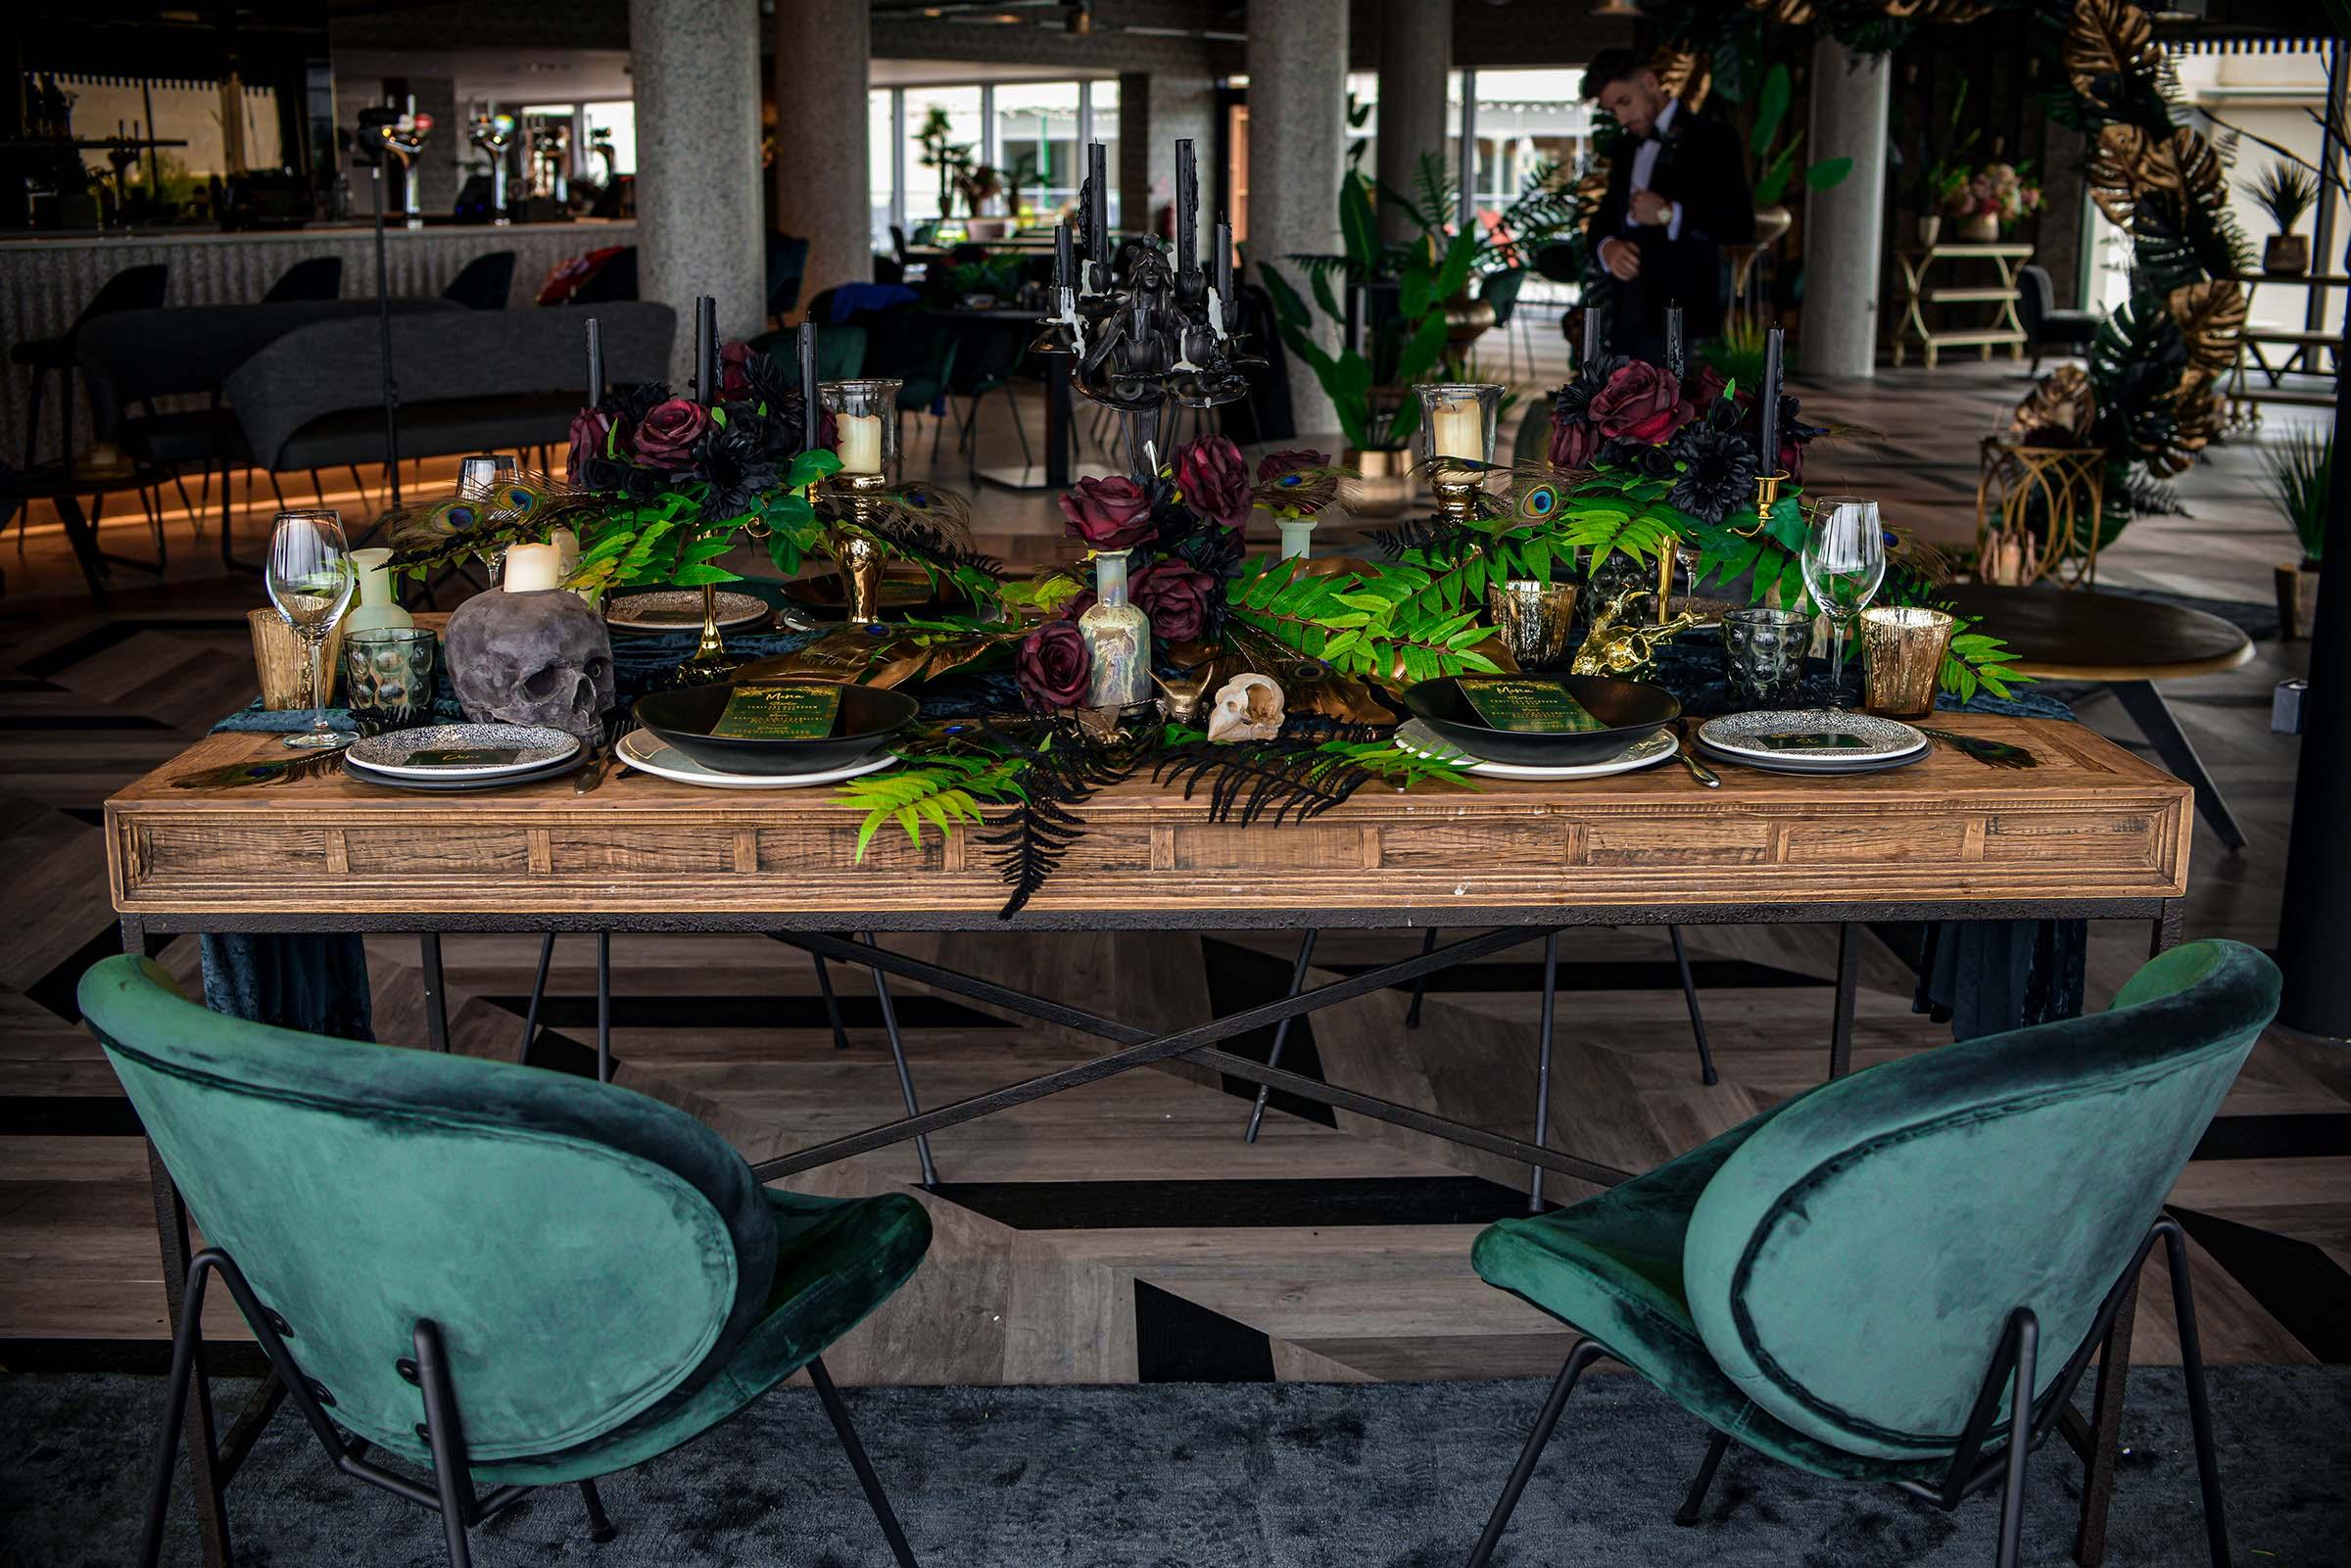 alternative luxe wedding - slytherin wedding - gothic wedding - alternative wedding - eclectic wedding table